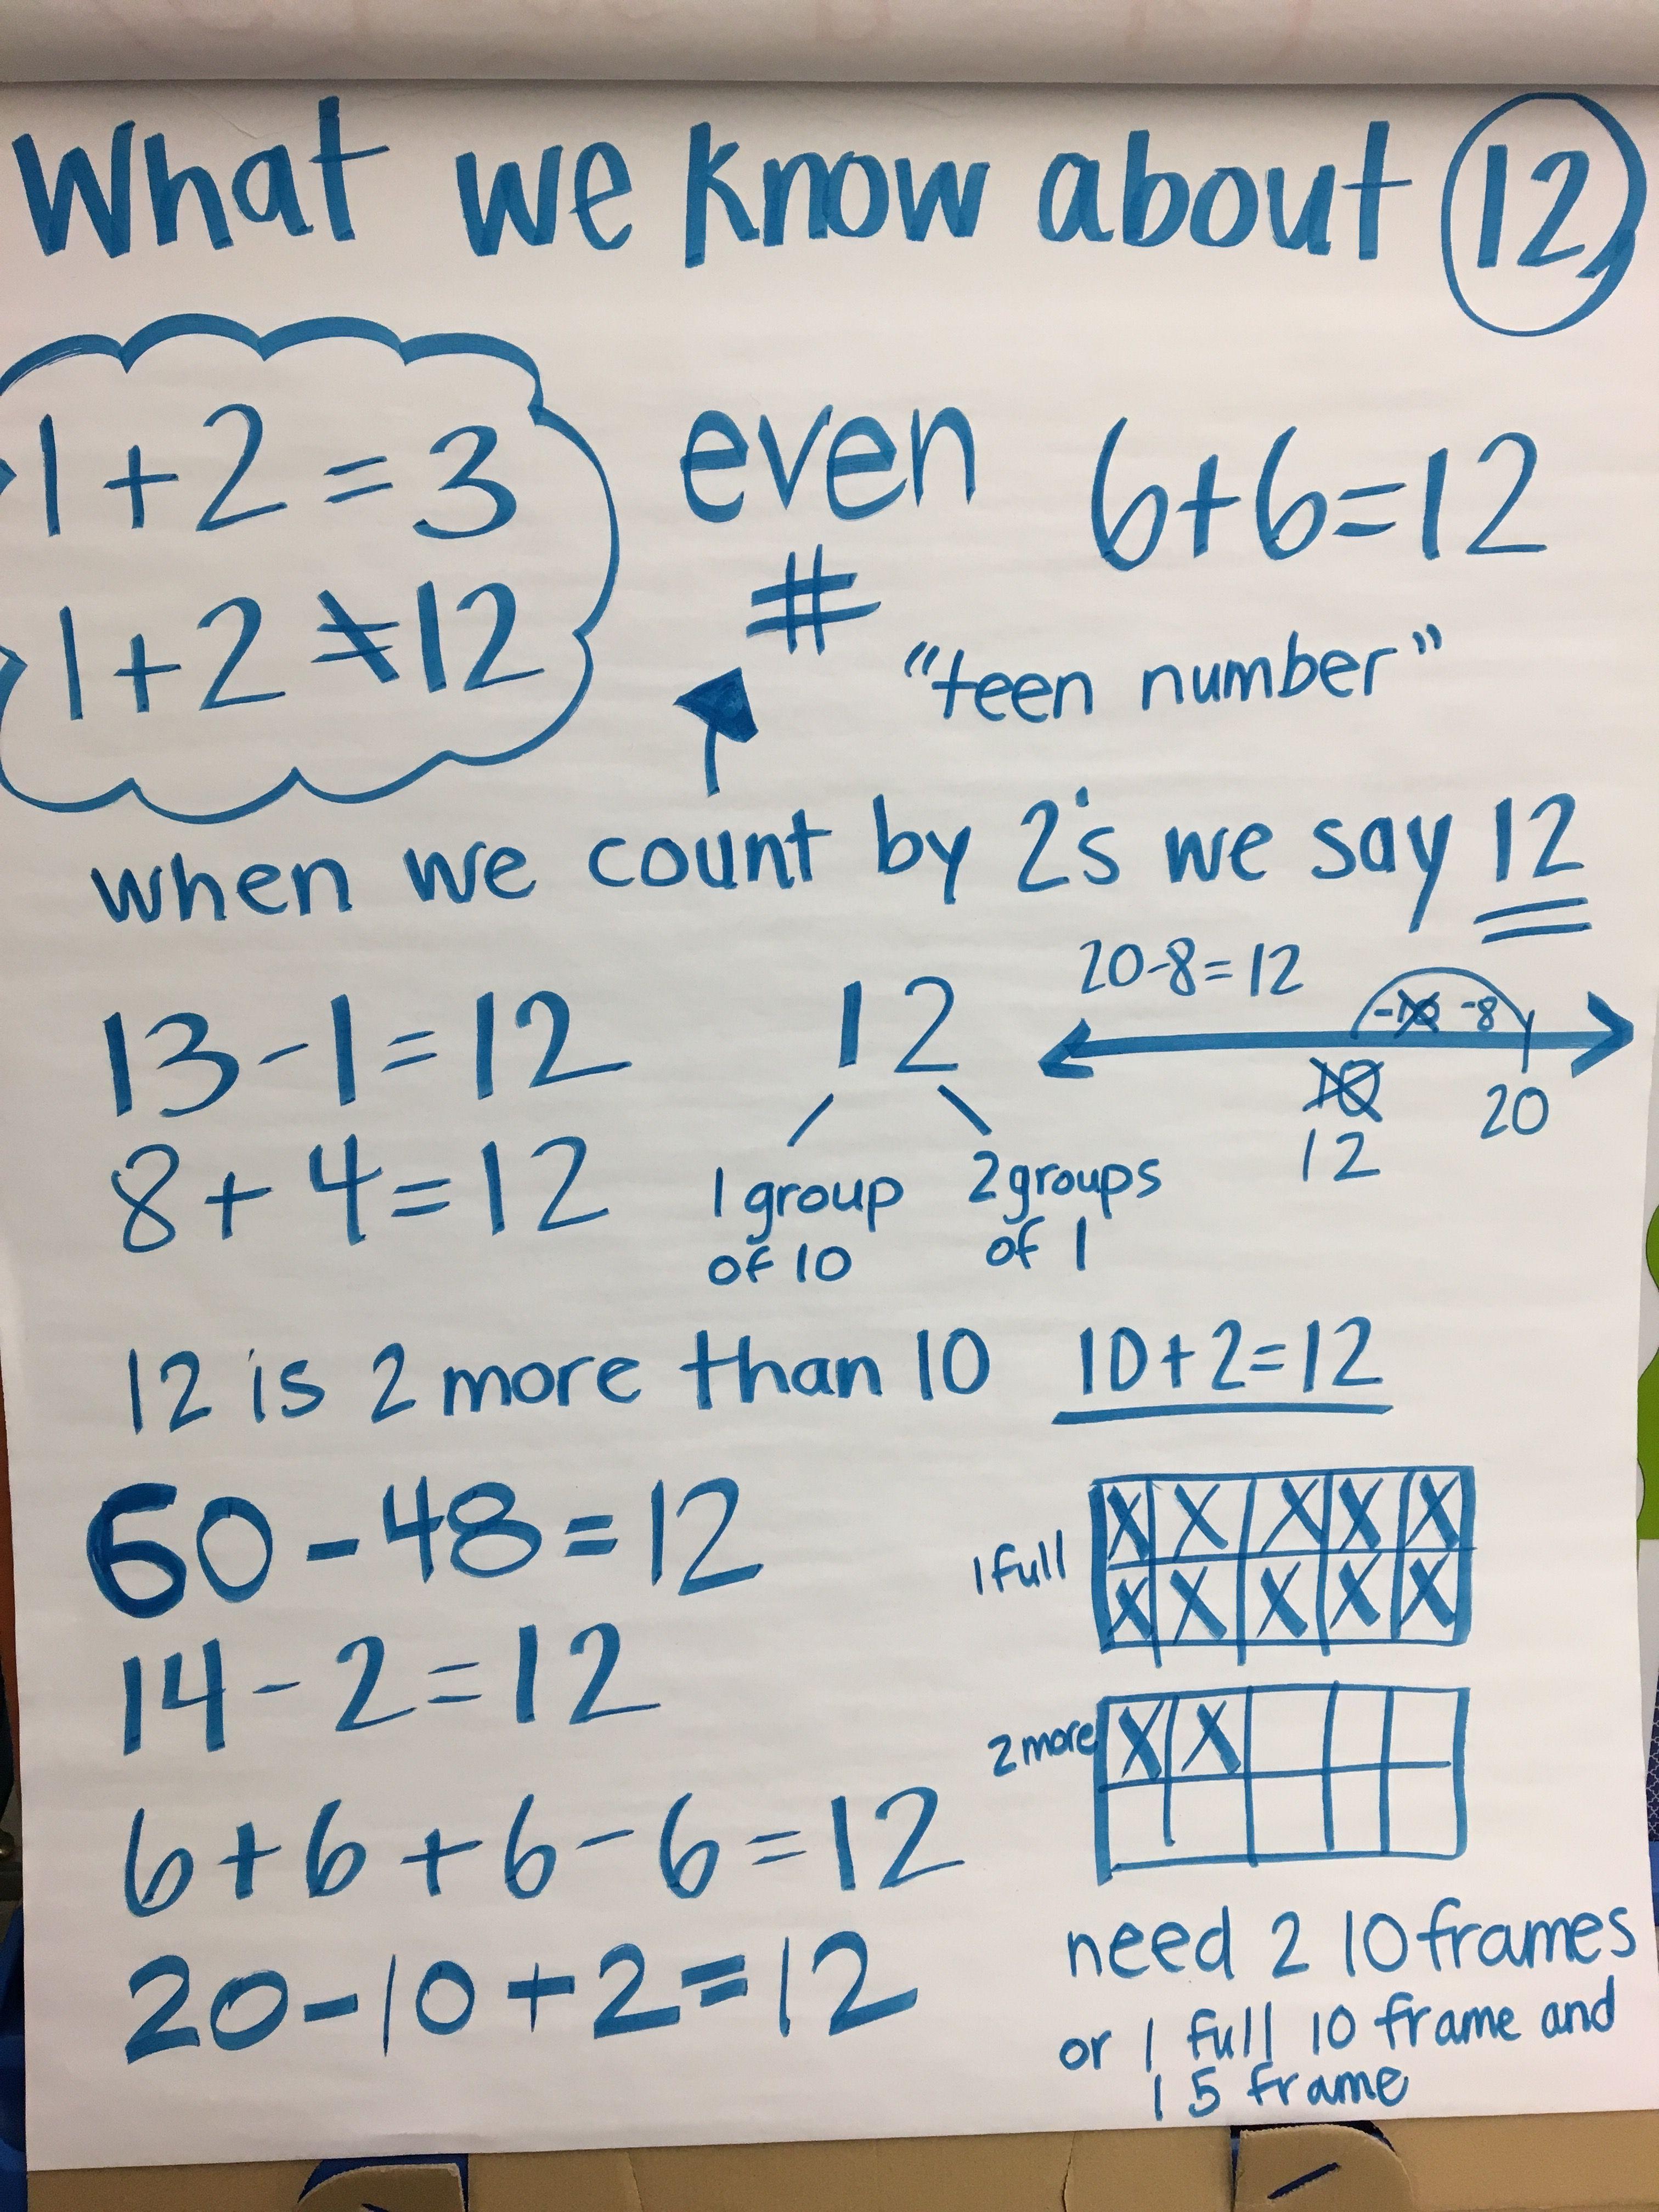 Dorable I Have A Math Question Images - Math Worksheets - modopol.com